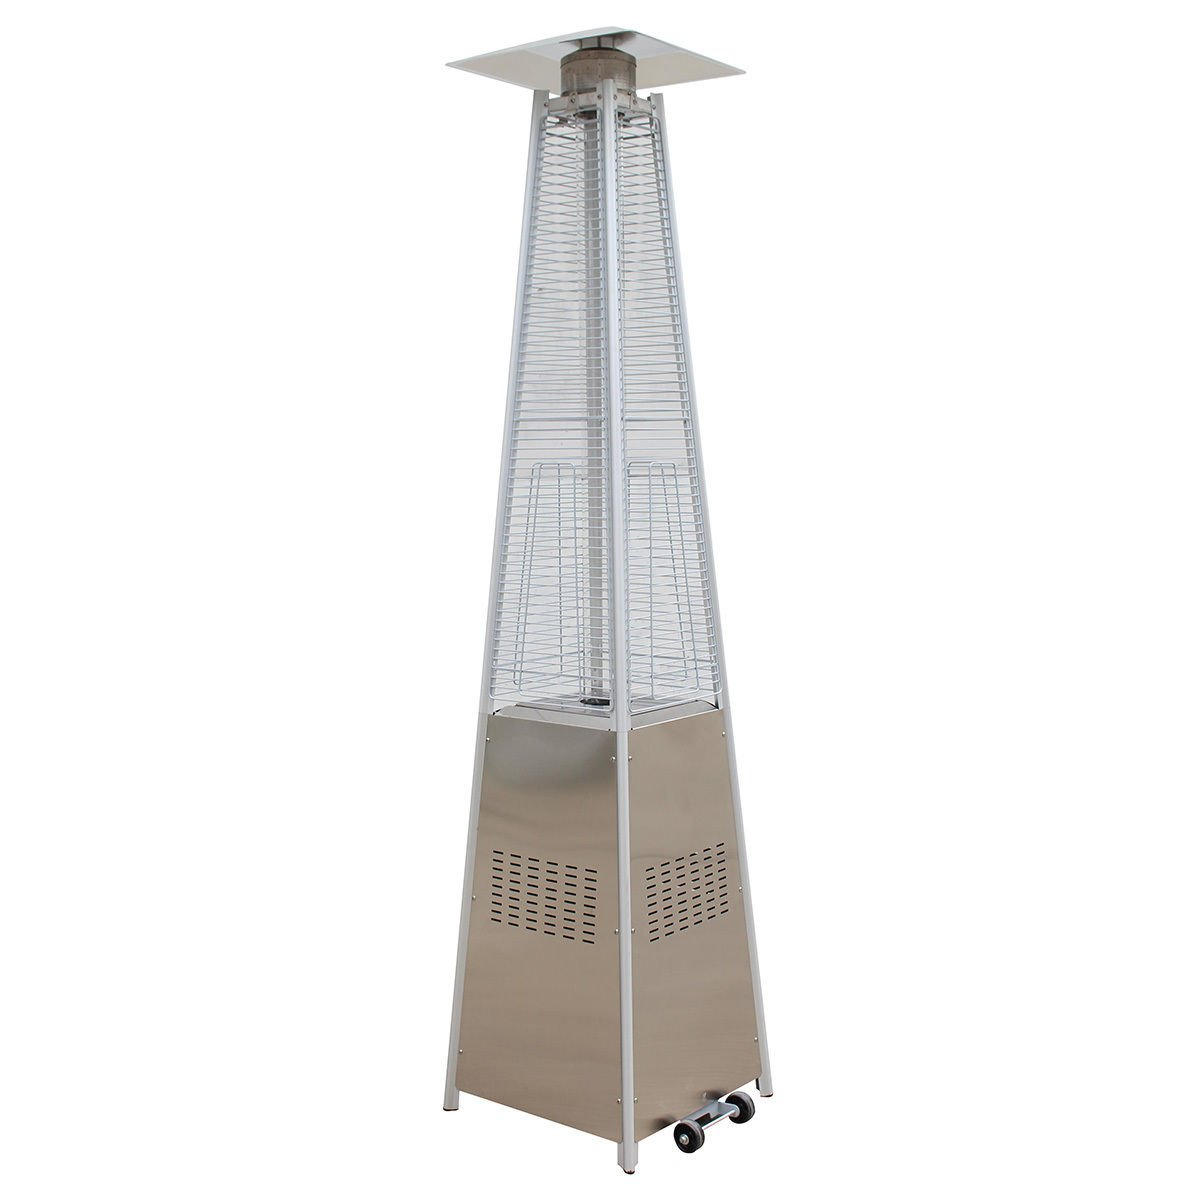 Elegant Amazon.com : Giantex 42, 000BTU Outdoor Pyramid Propane Glass Tube Dancing  Flames Patio Heater : Garden U0026 Outdoor